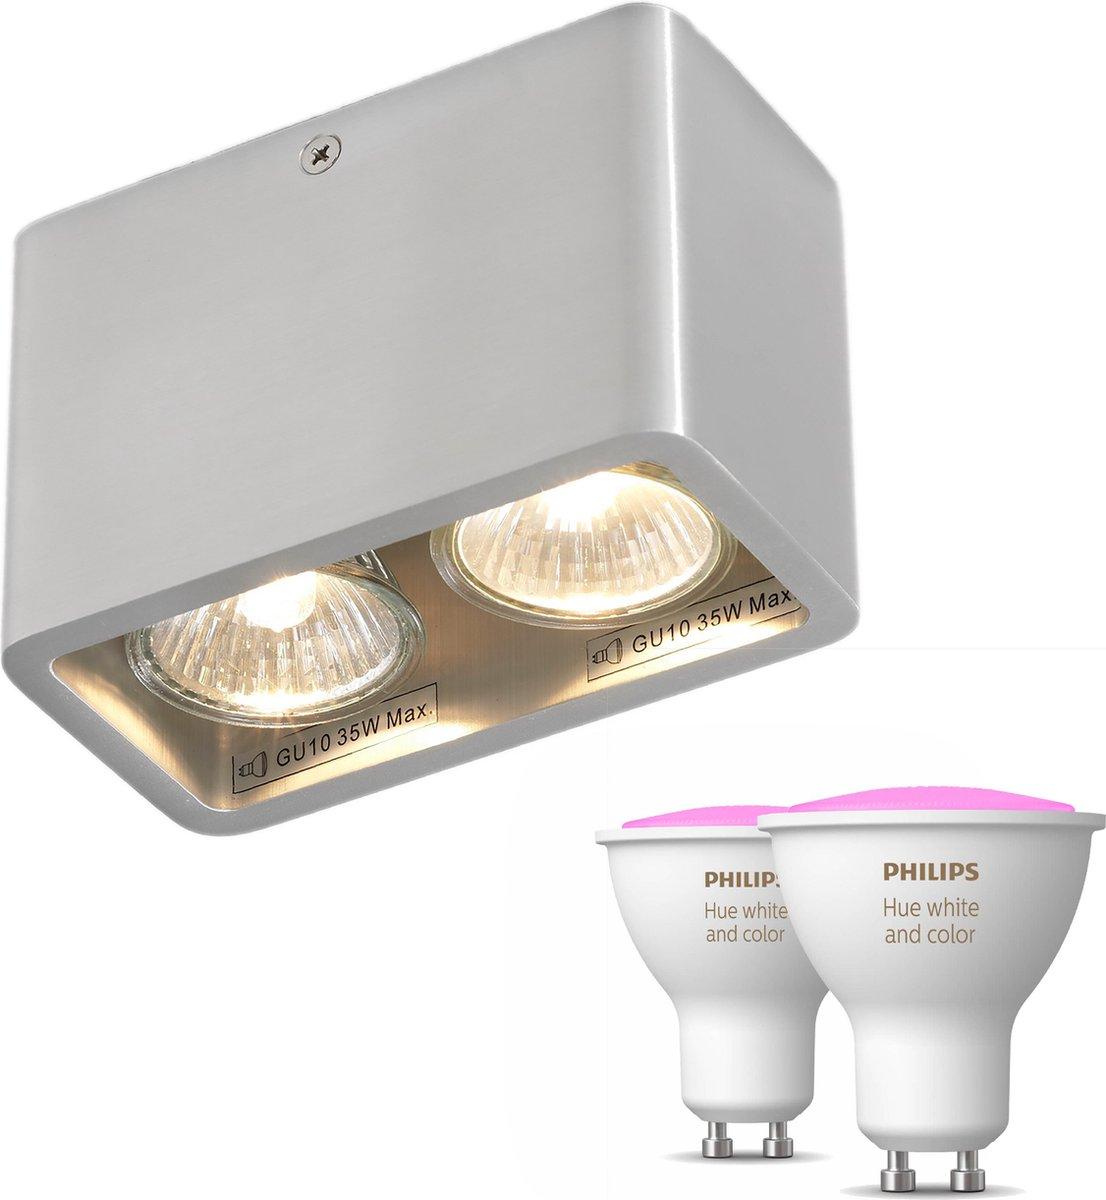 Artdelight Moni opbouwspot - Zilver - 2 lichtpunten - Incl. Philips Hue White & Color Ambiance Gu10